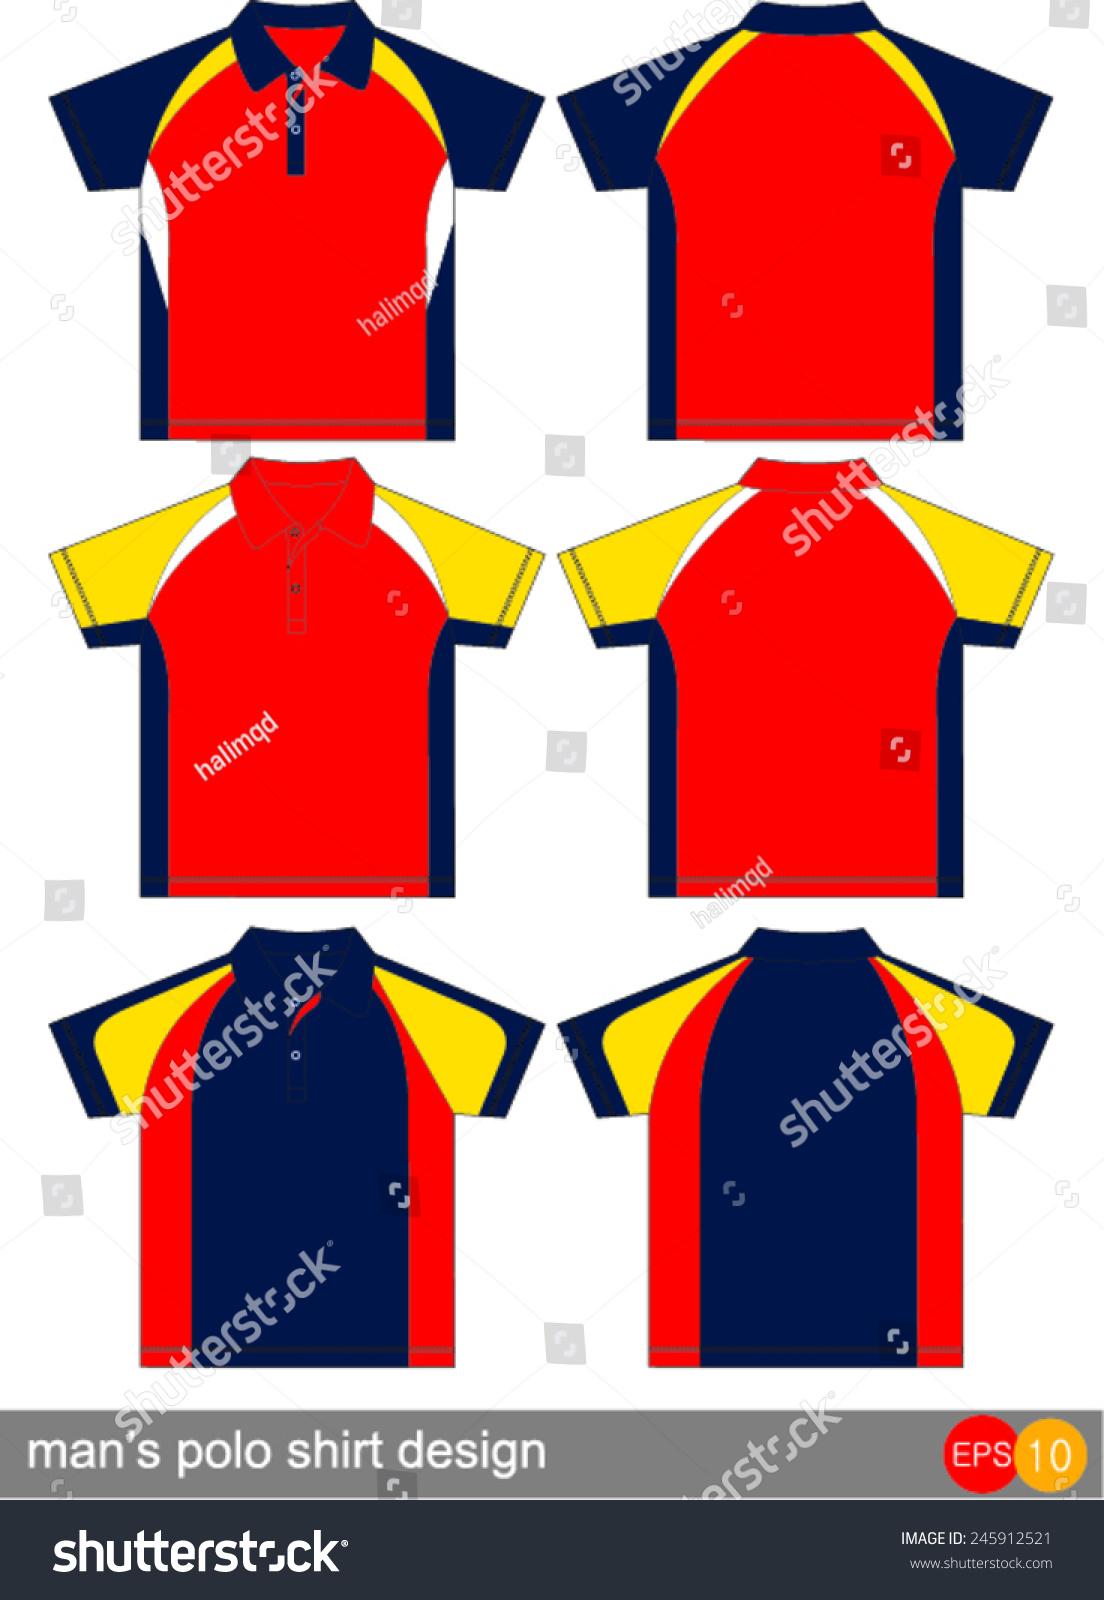 Polo shirt design vector - Polo Shirt Design Vector Template